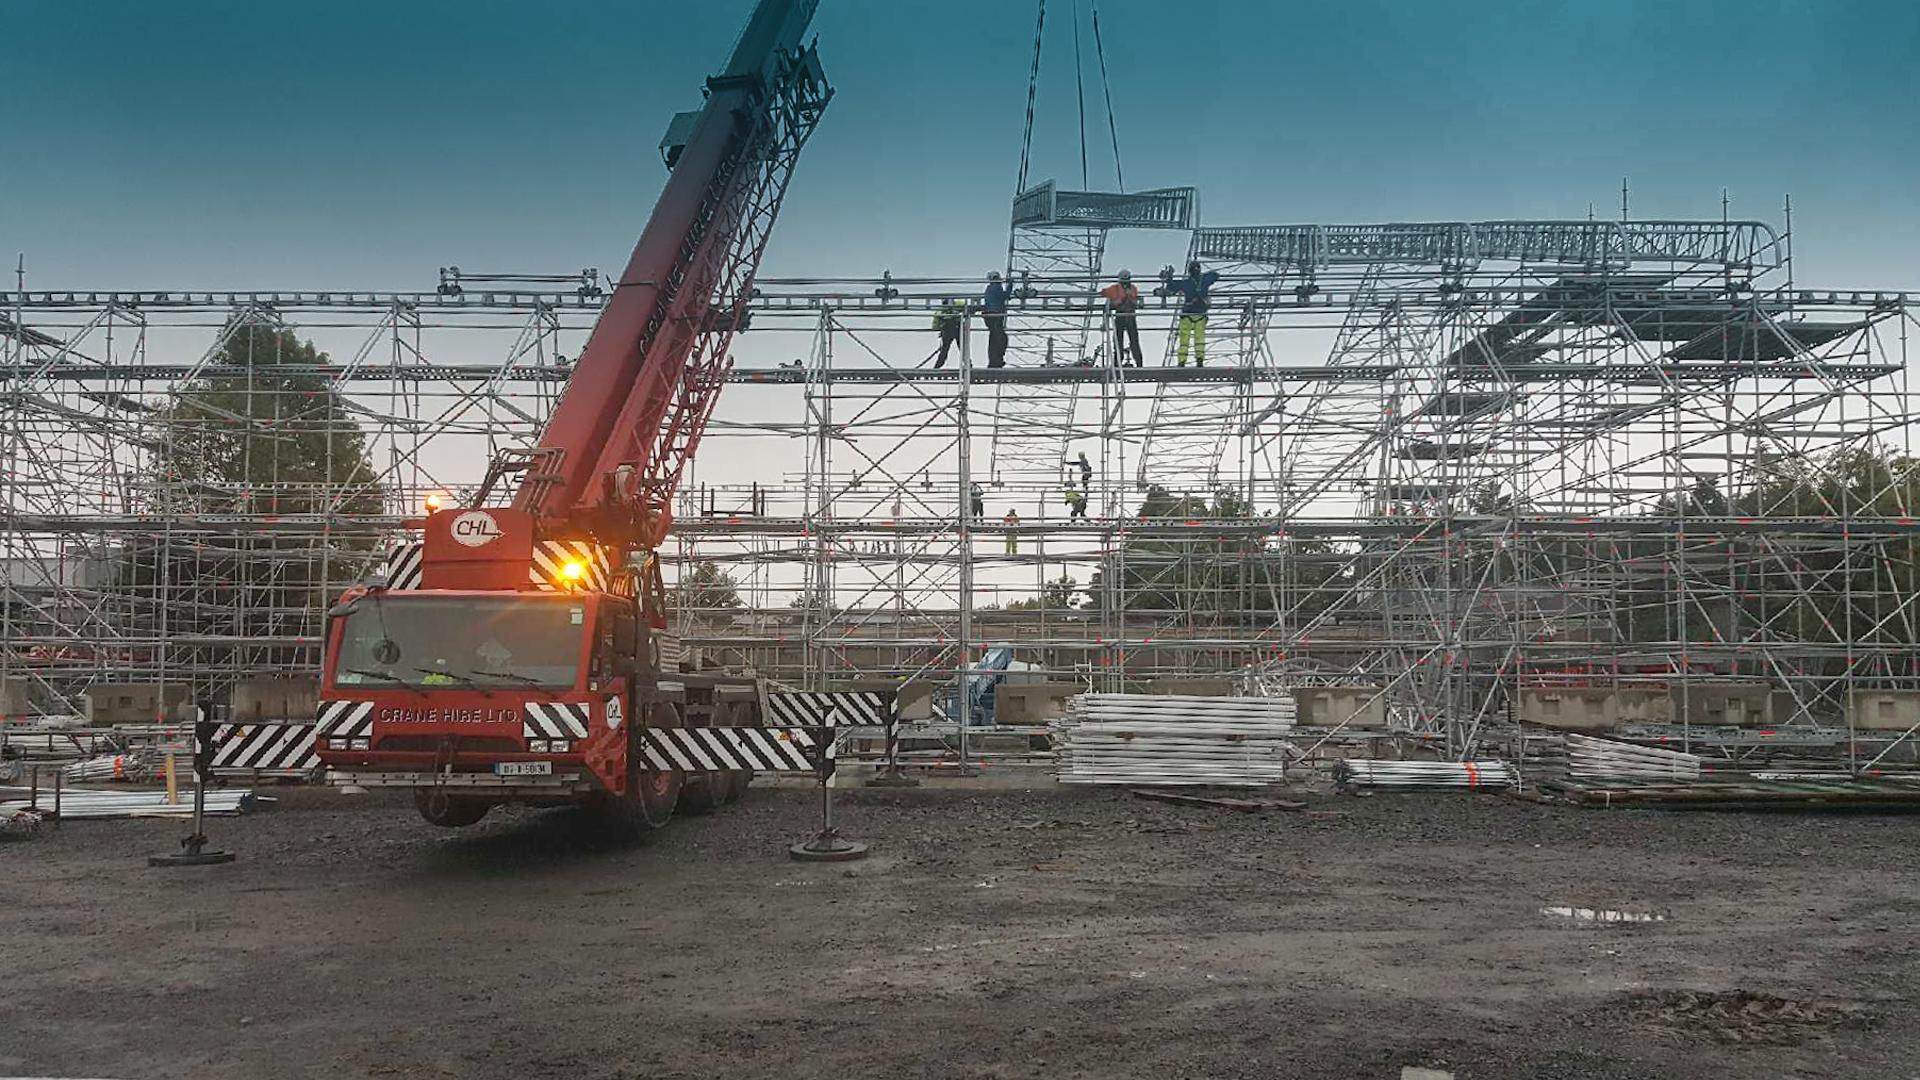 scaffolding contractors company dublin